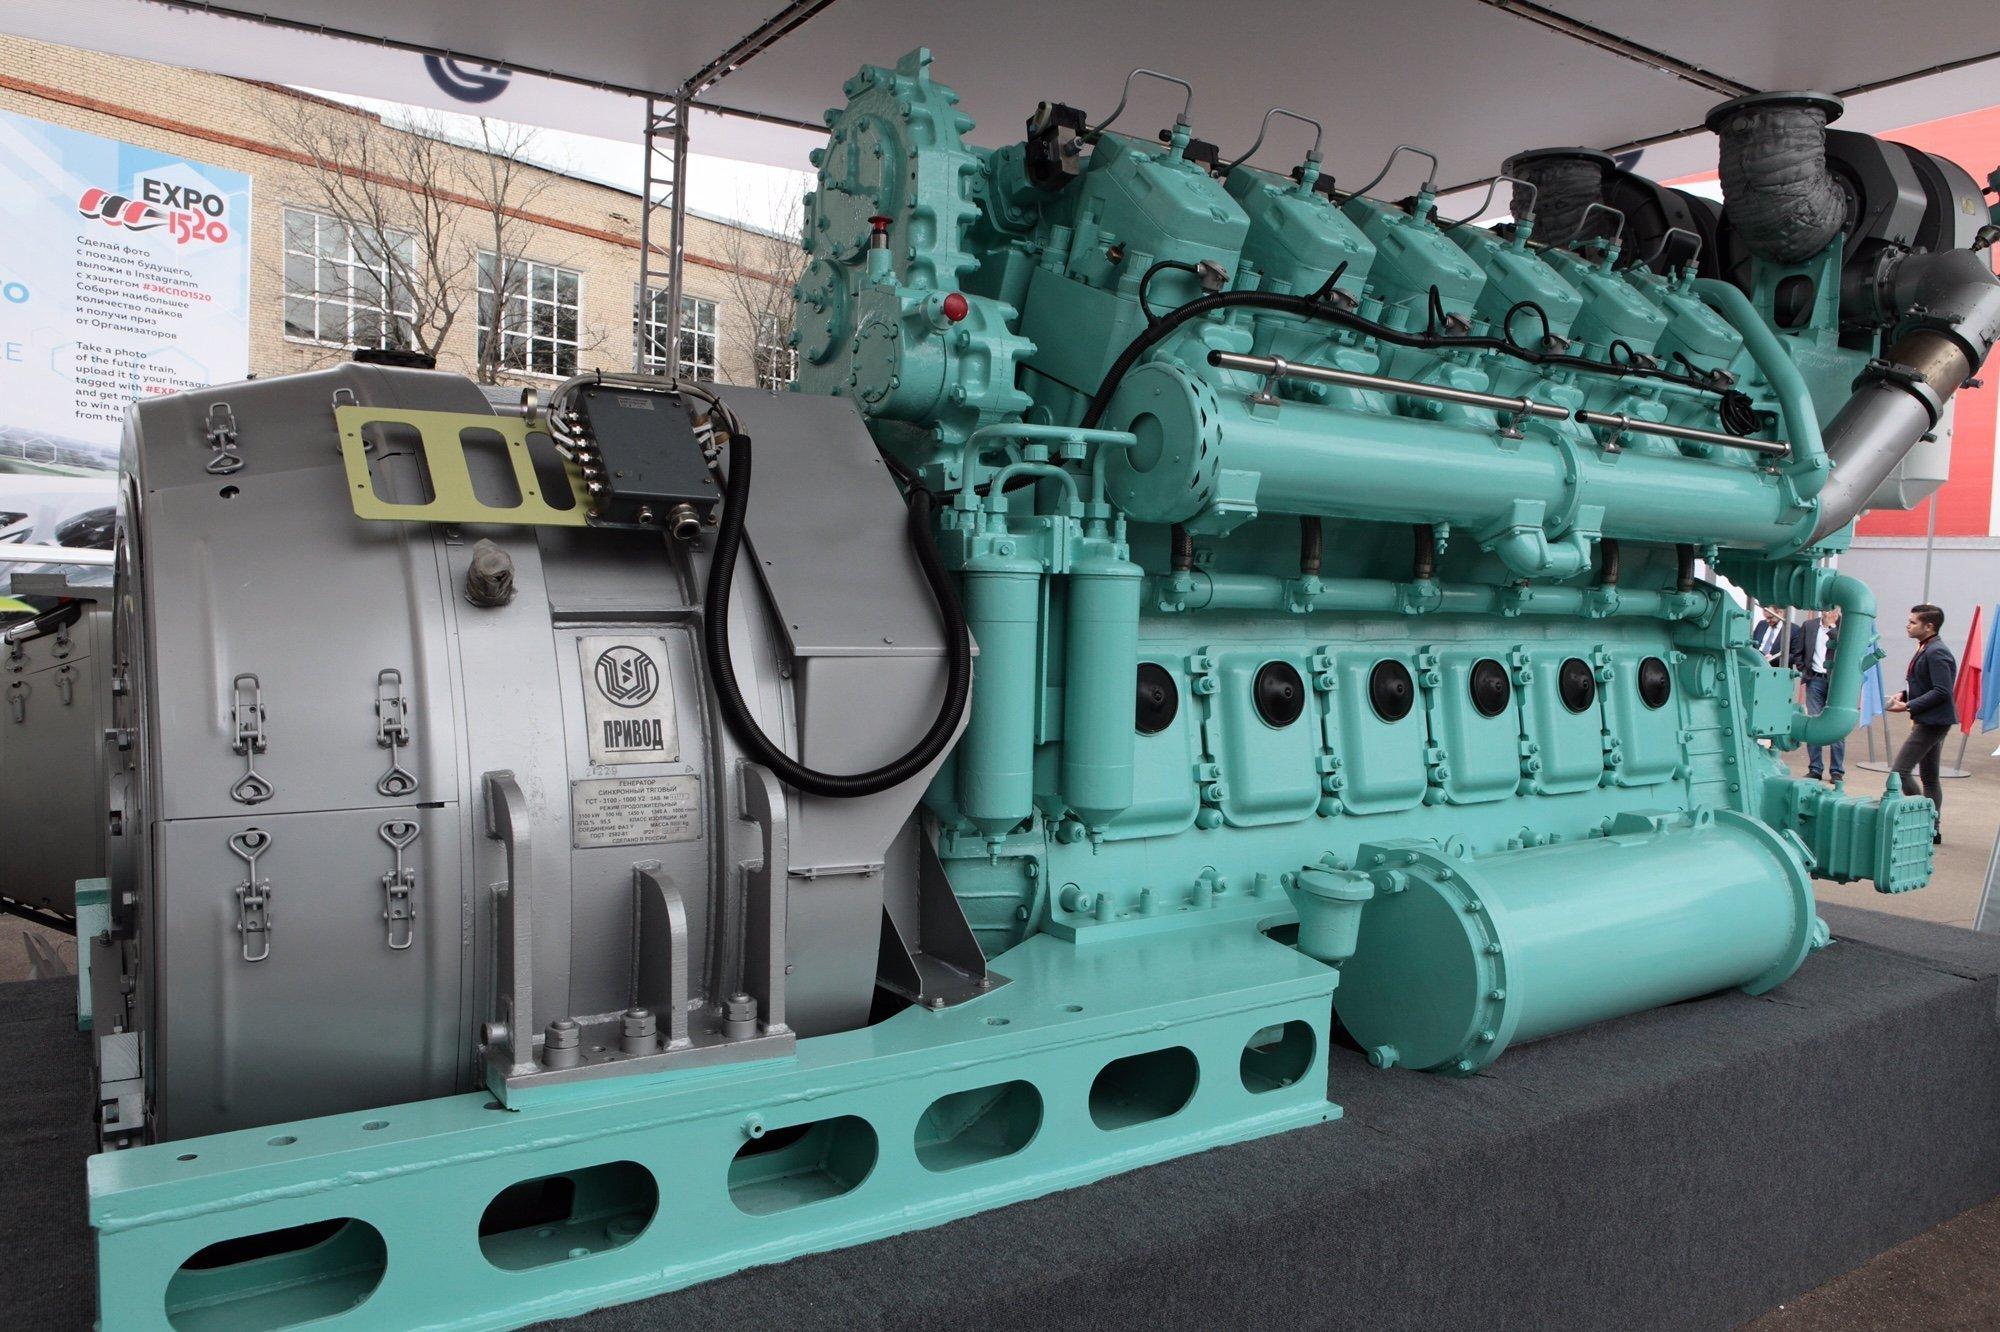 El motor diésel D300 fabricado por Transmasholding